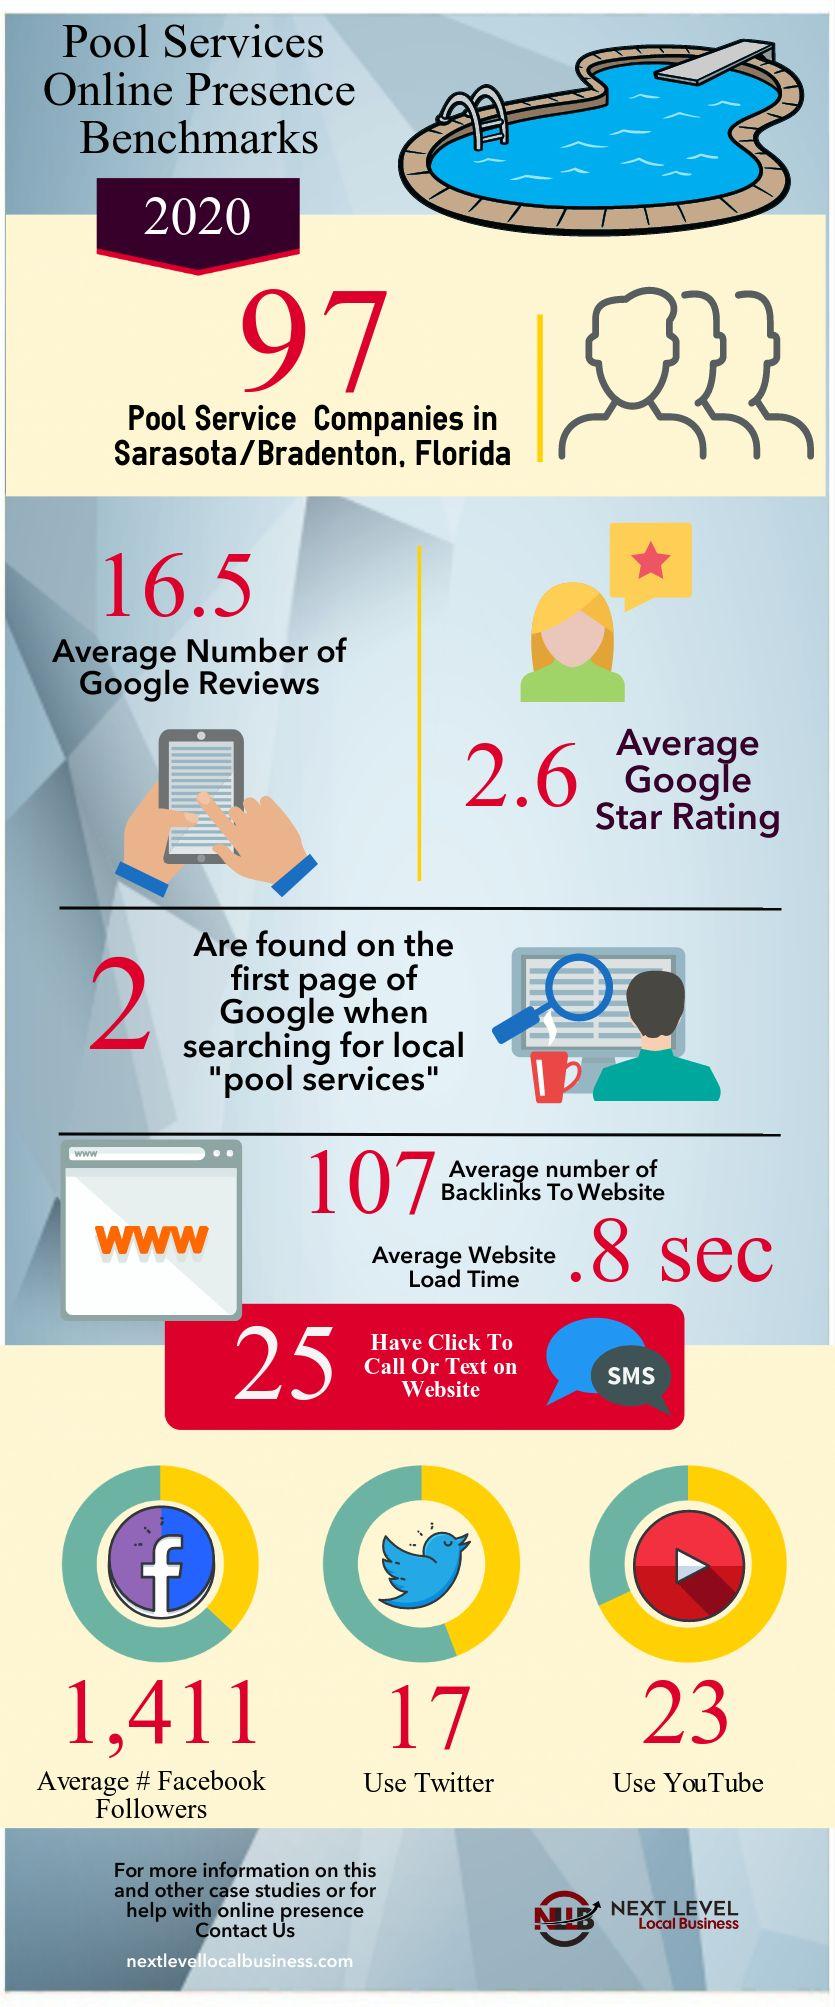 Sarasota Pool Services Online Presence